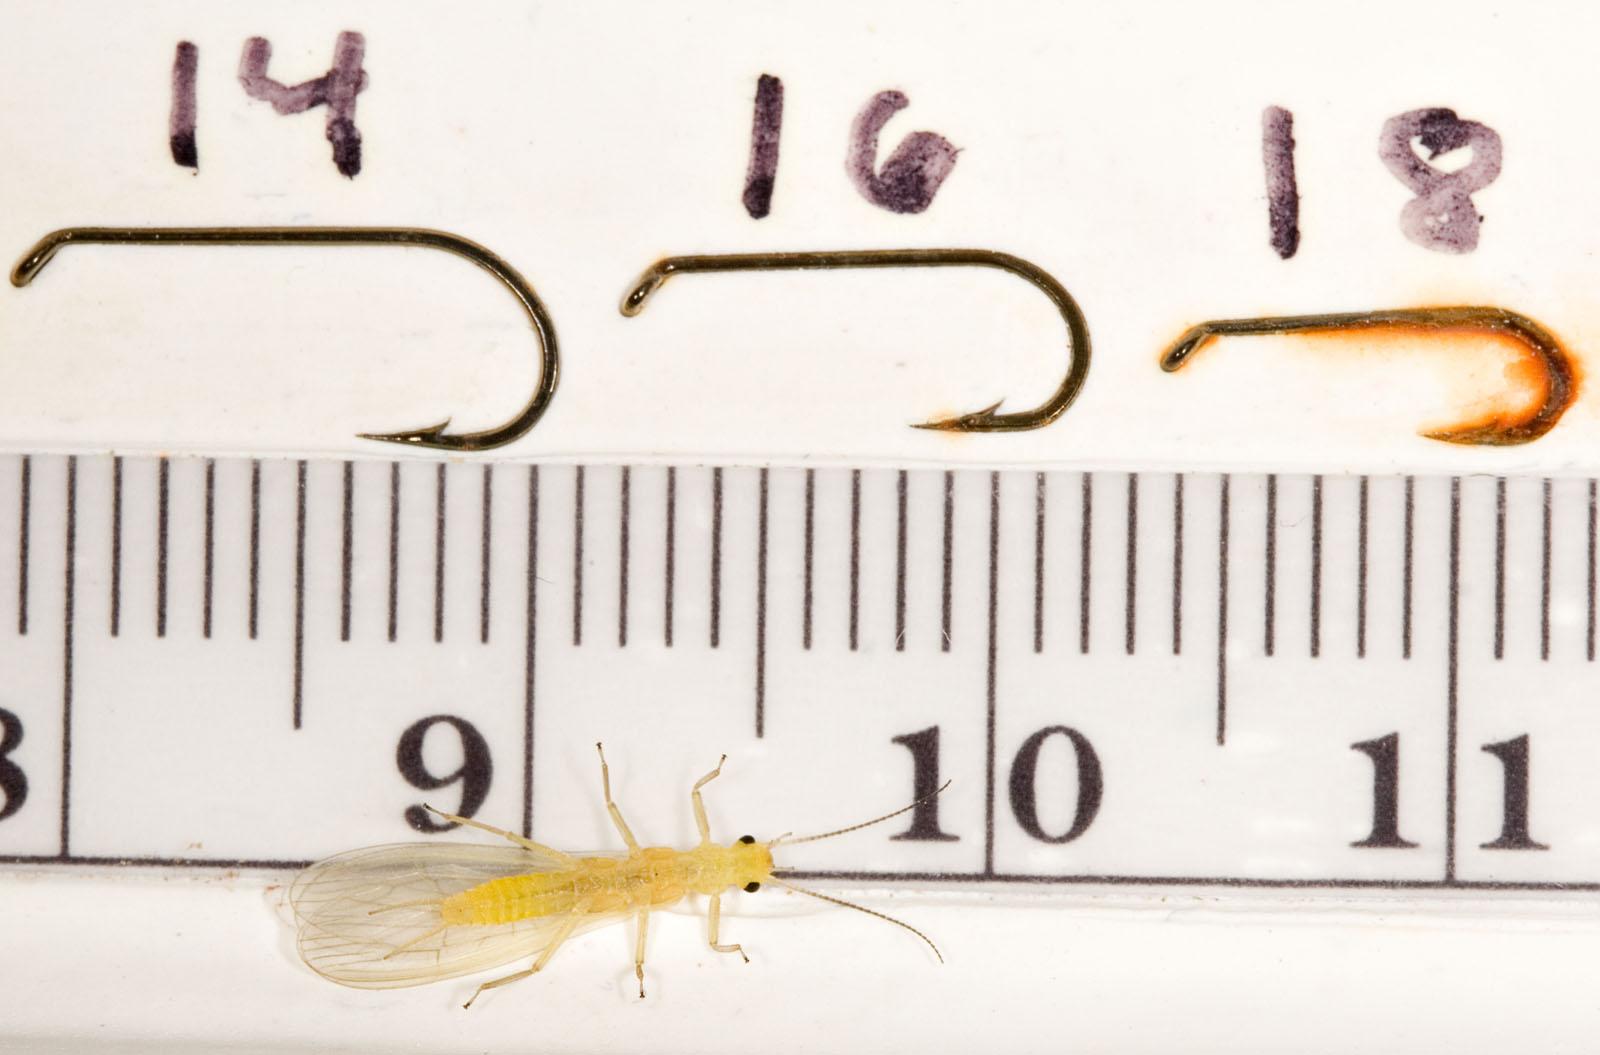 Sweltsa onkos (Sallfly) Stonefly Adult from Mystery Creek #62 in New York